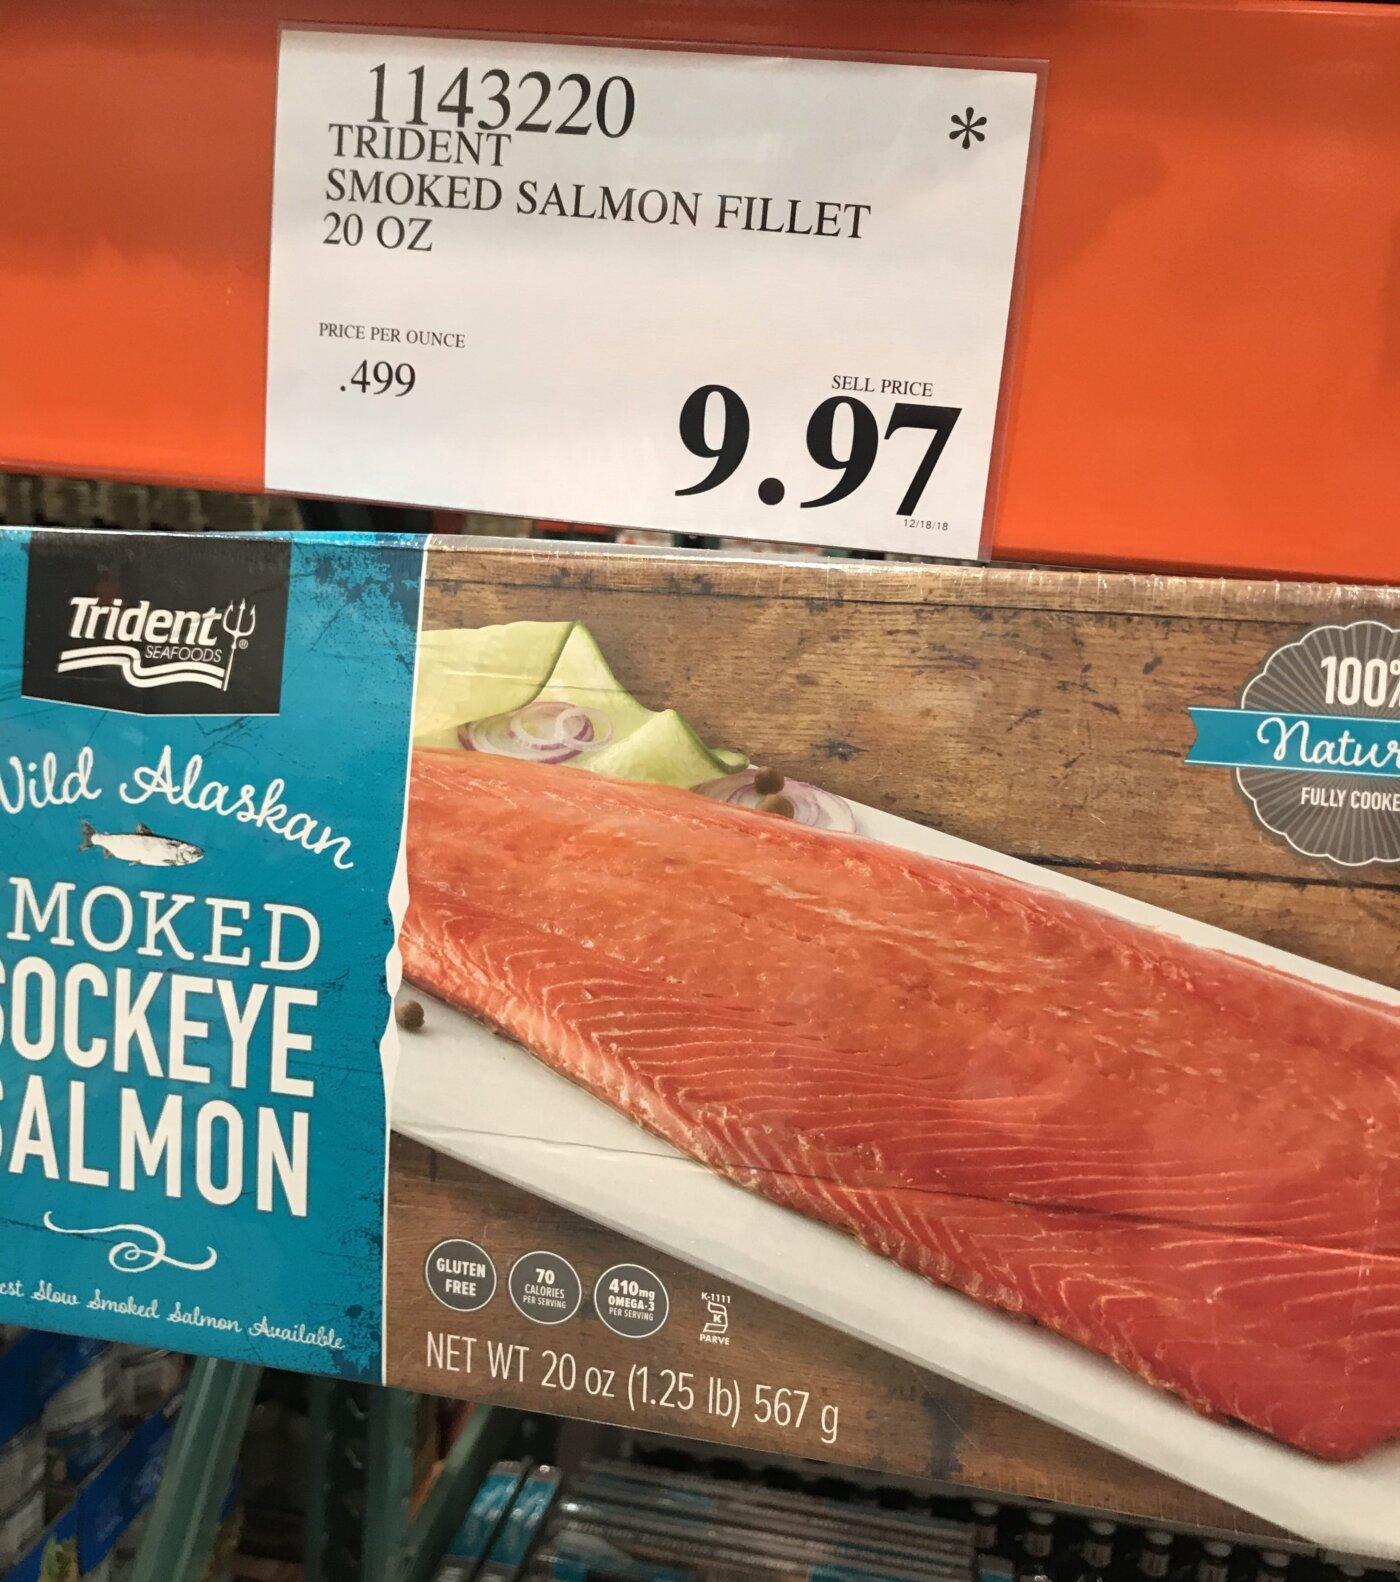 Trident Smoke Salmon Fillet